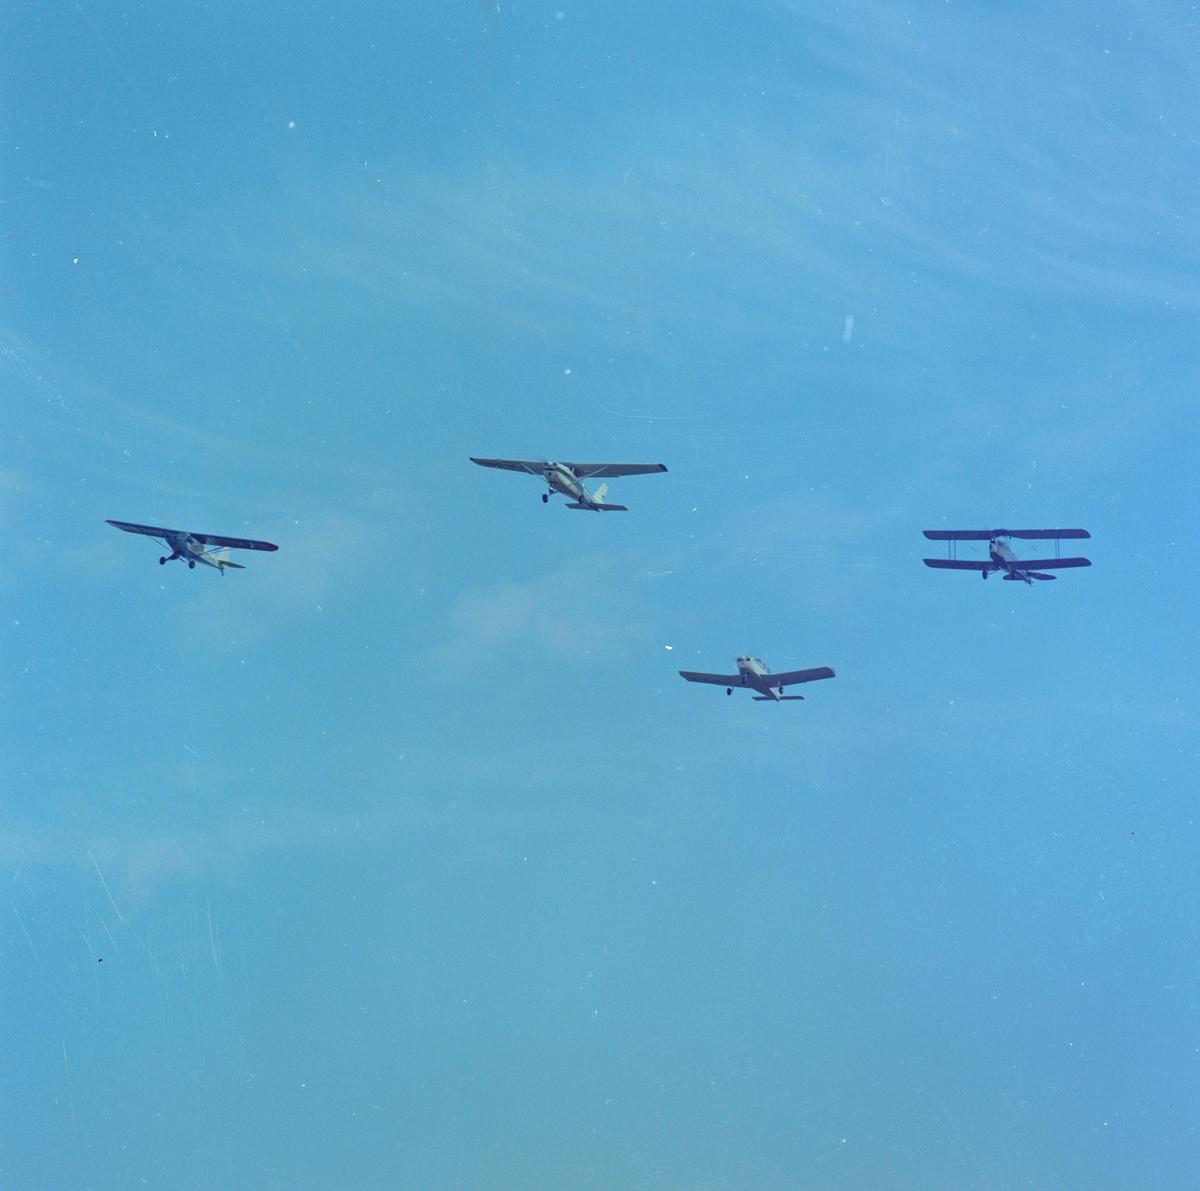 Fly i lufta, demonstrasjonsflygning av Gardermoen flyklubb.